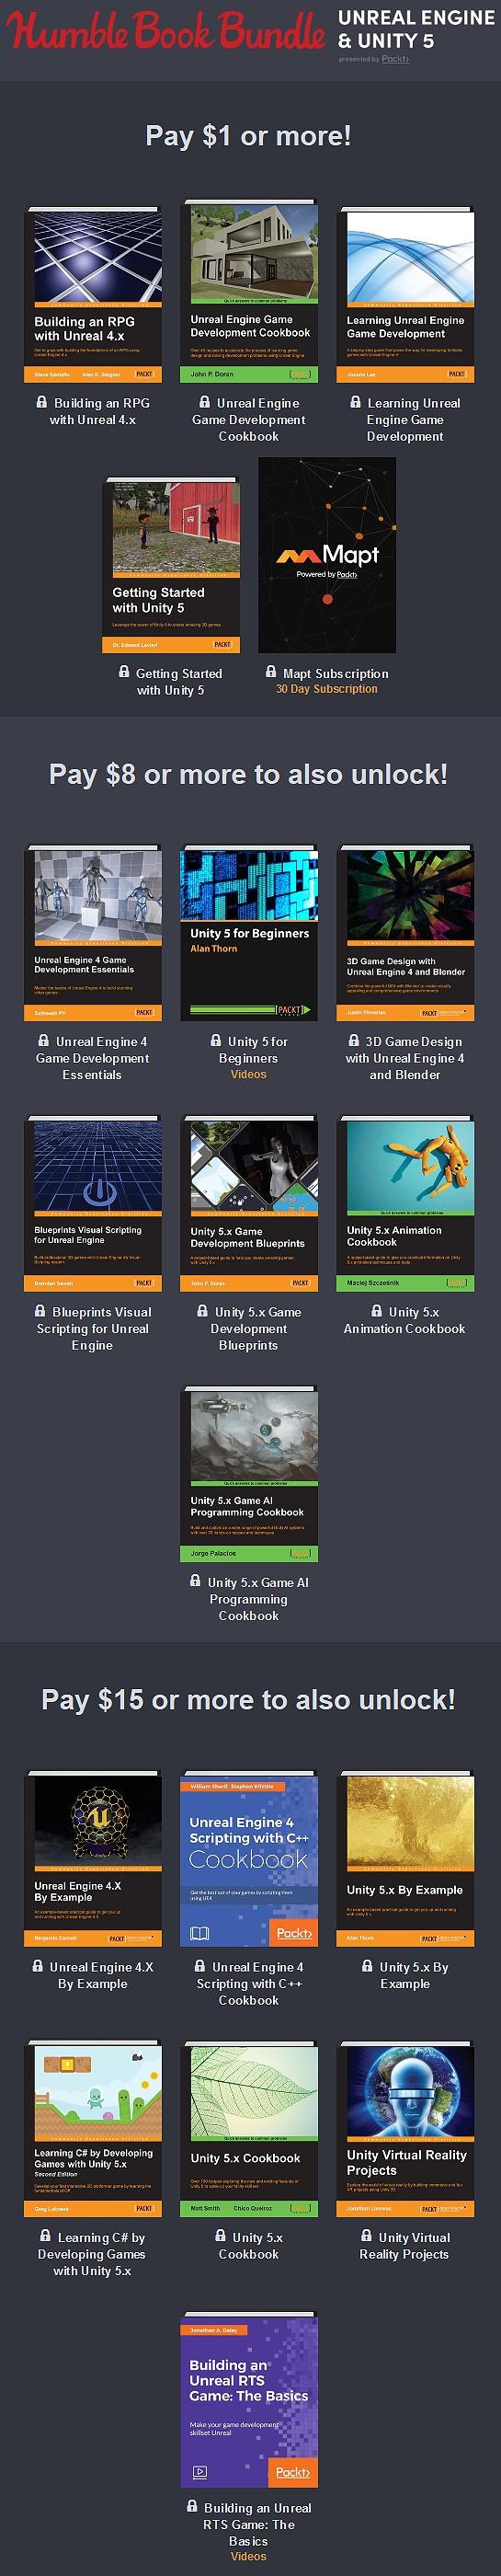 jasonjss: Humble Book Bundle: Unreal Engine & Unity 5